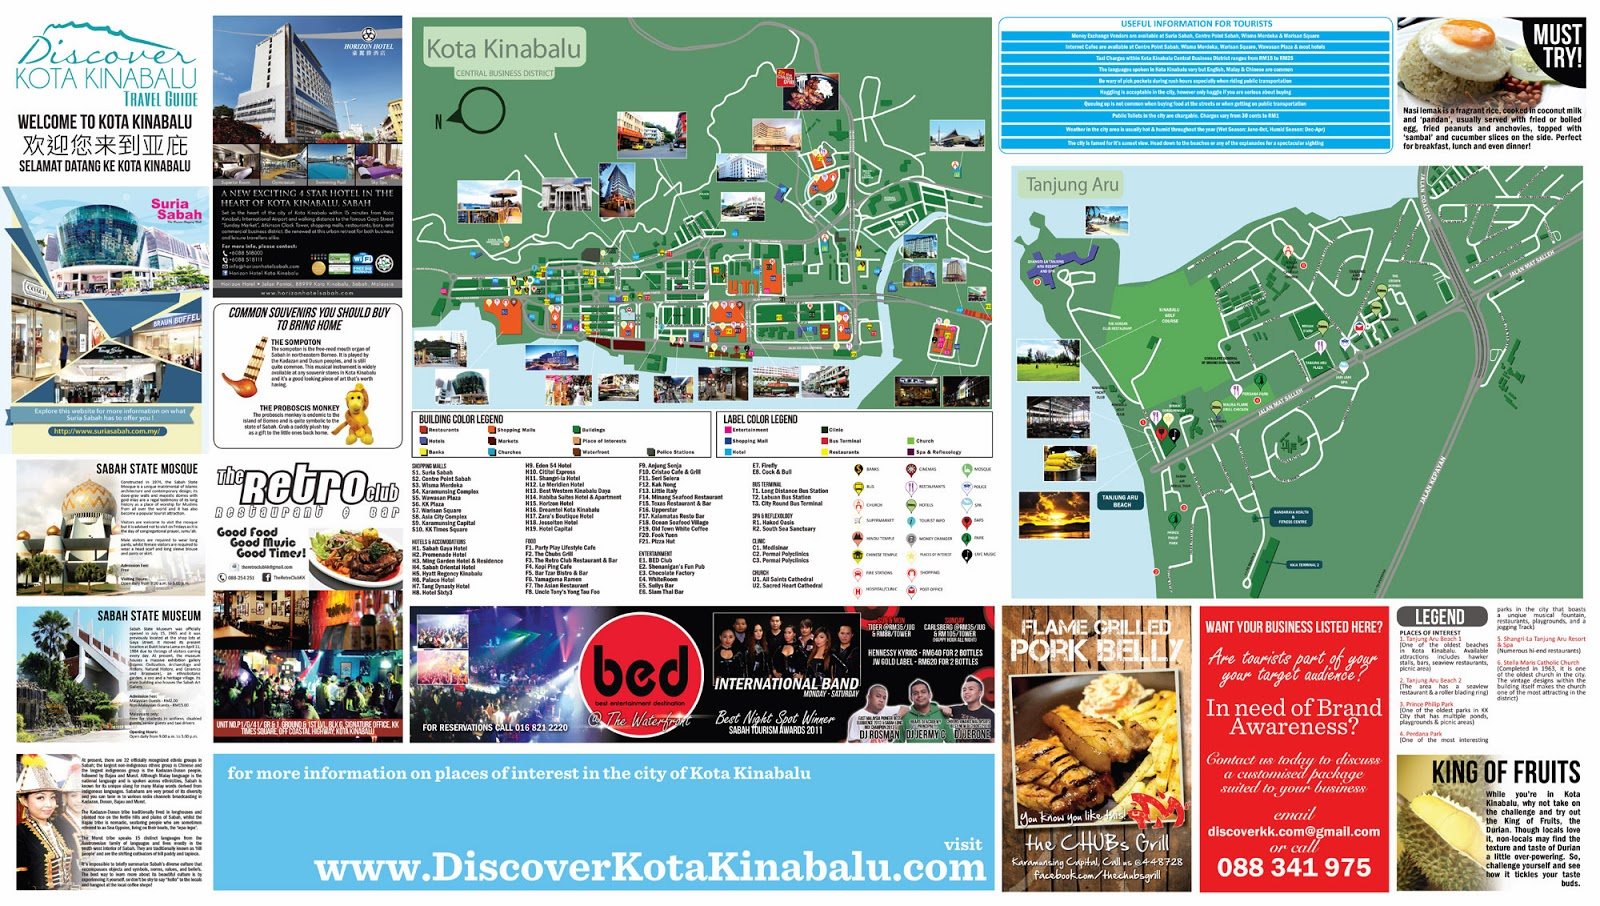 Discover Kota Kinabalu Kota Kinabalu City Probably The Best City